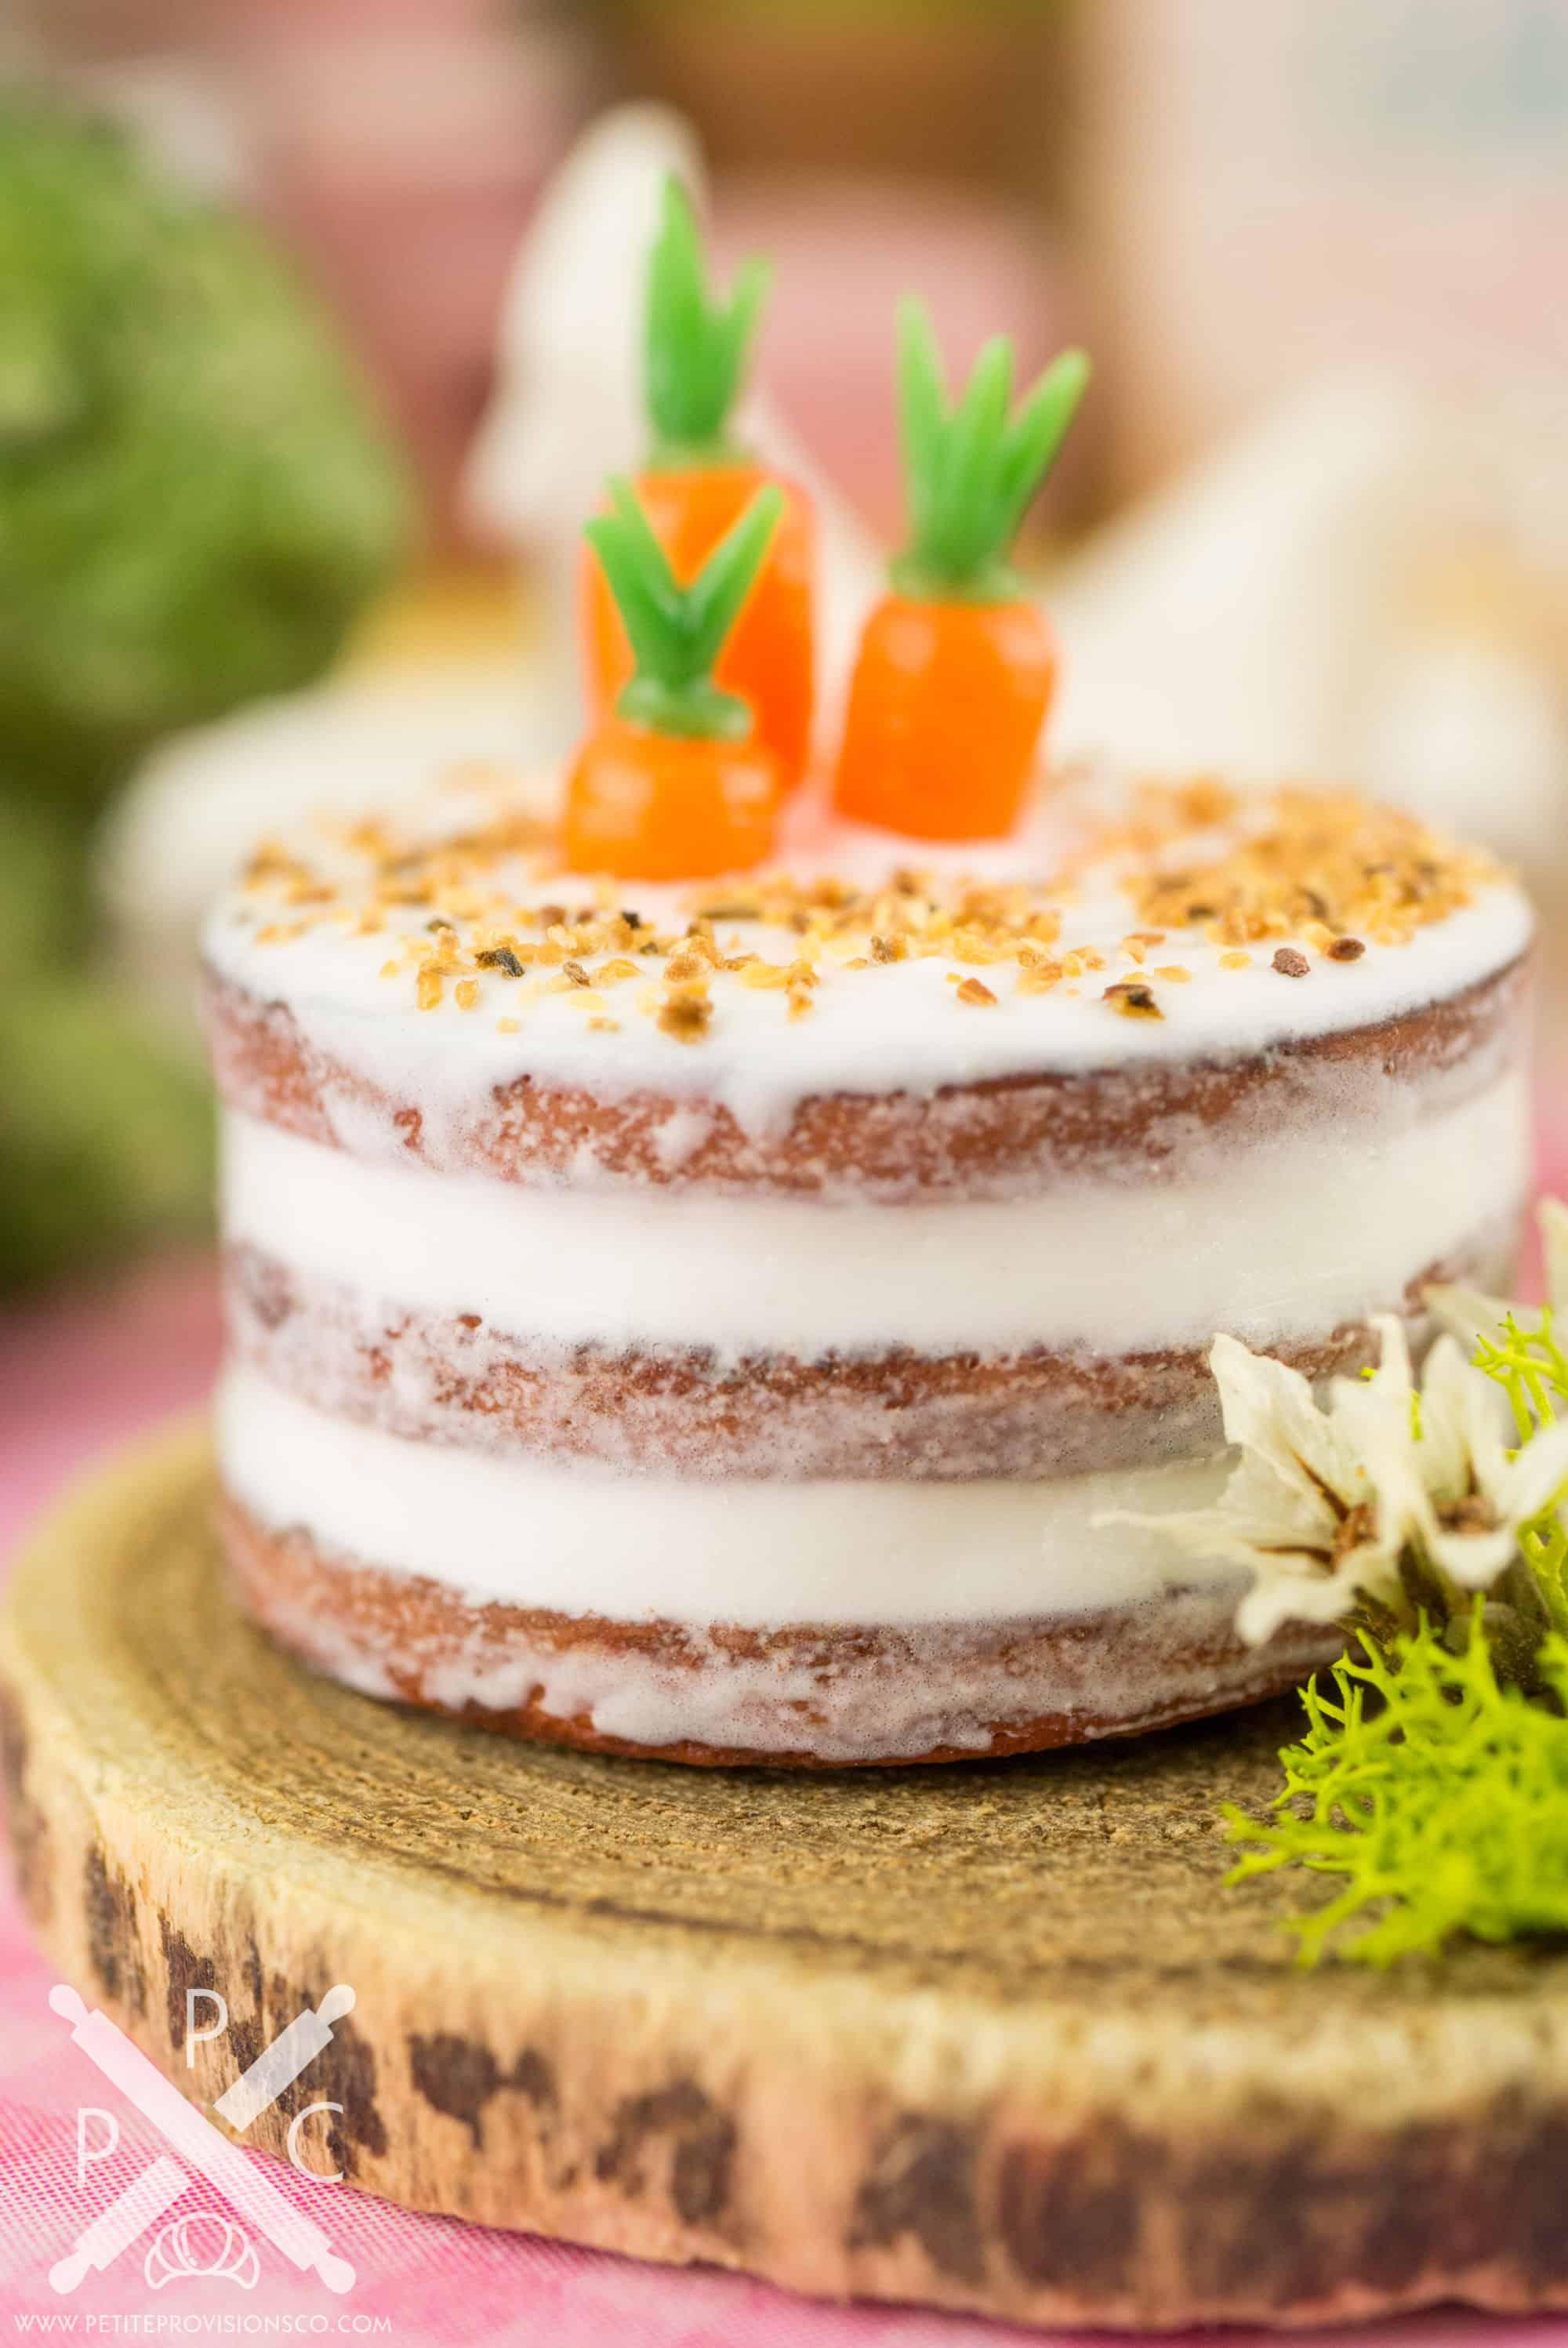 Naked Carrot Cake with Ginger Cream Frosting - Emily Ellyn